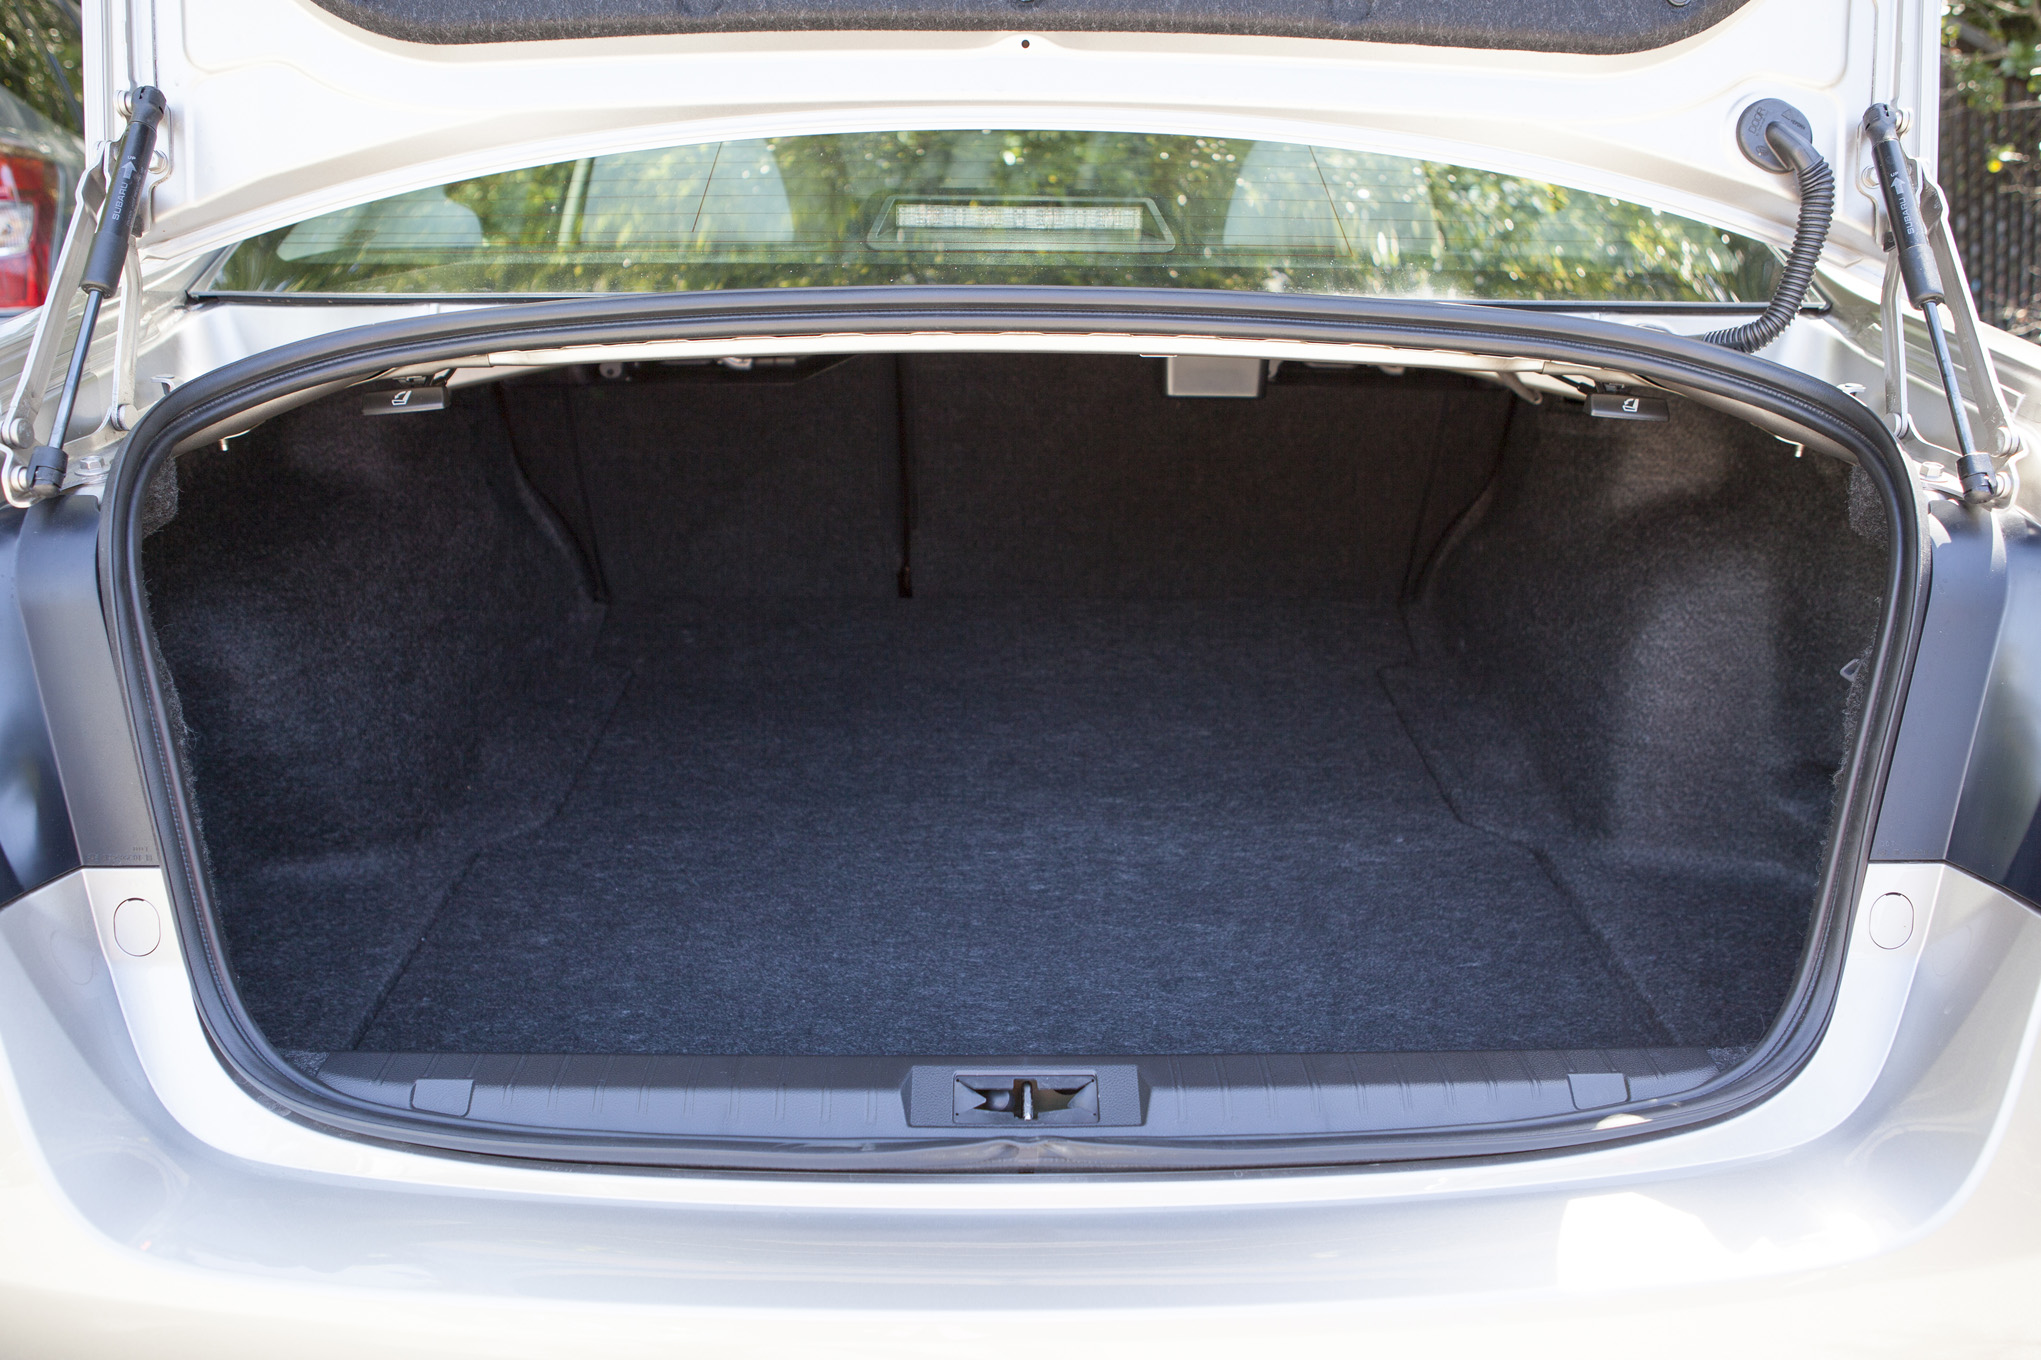 2015 Subaru Legacy Trunk